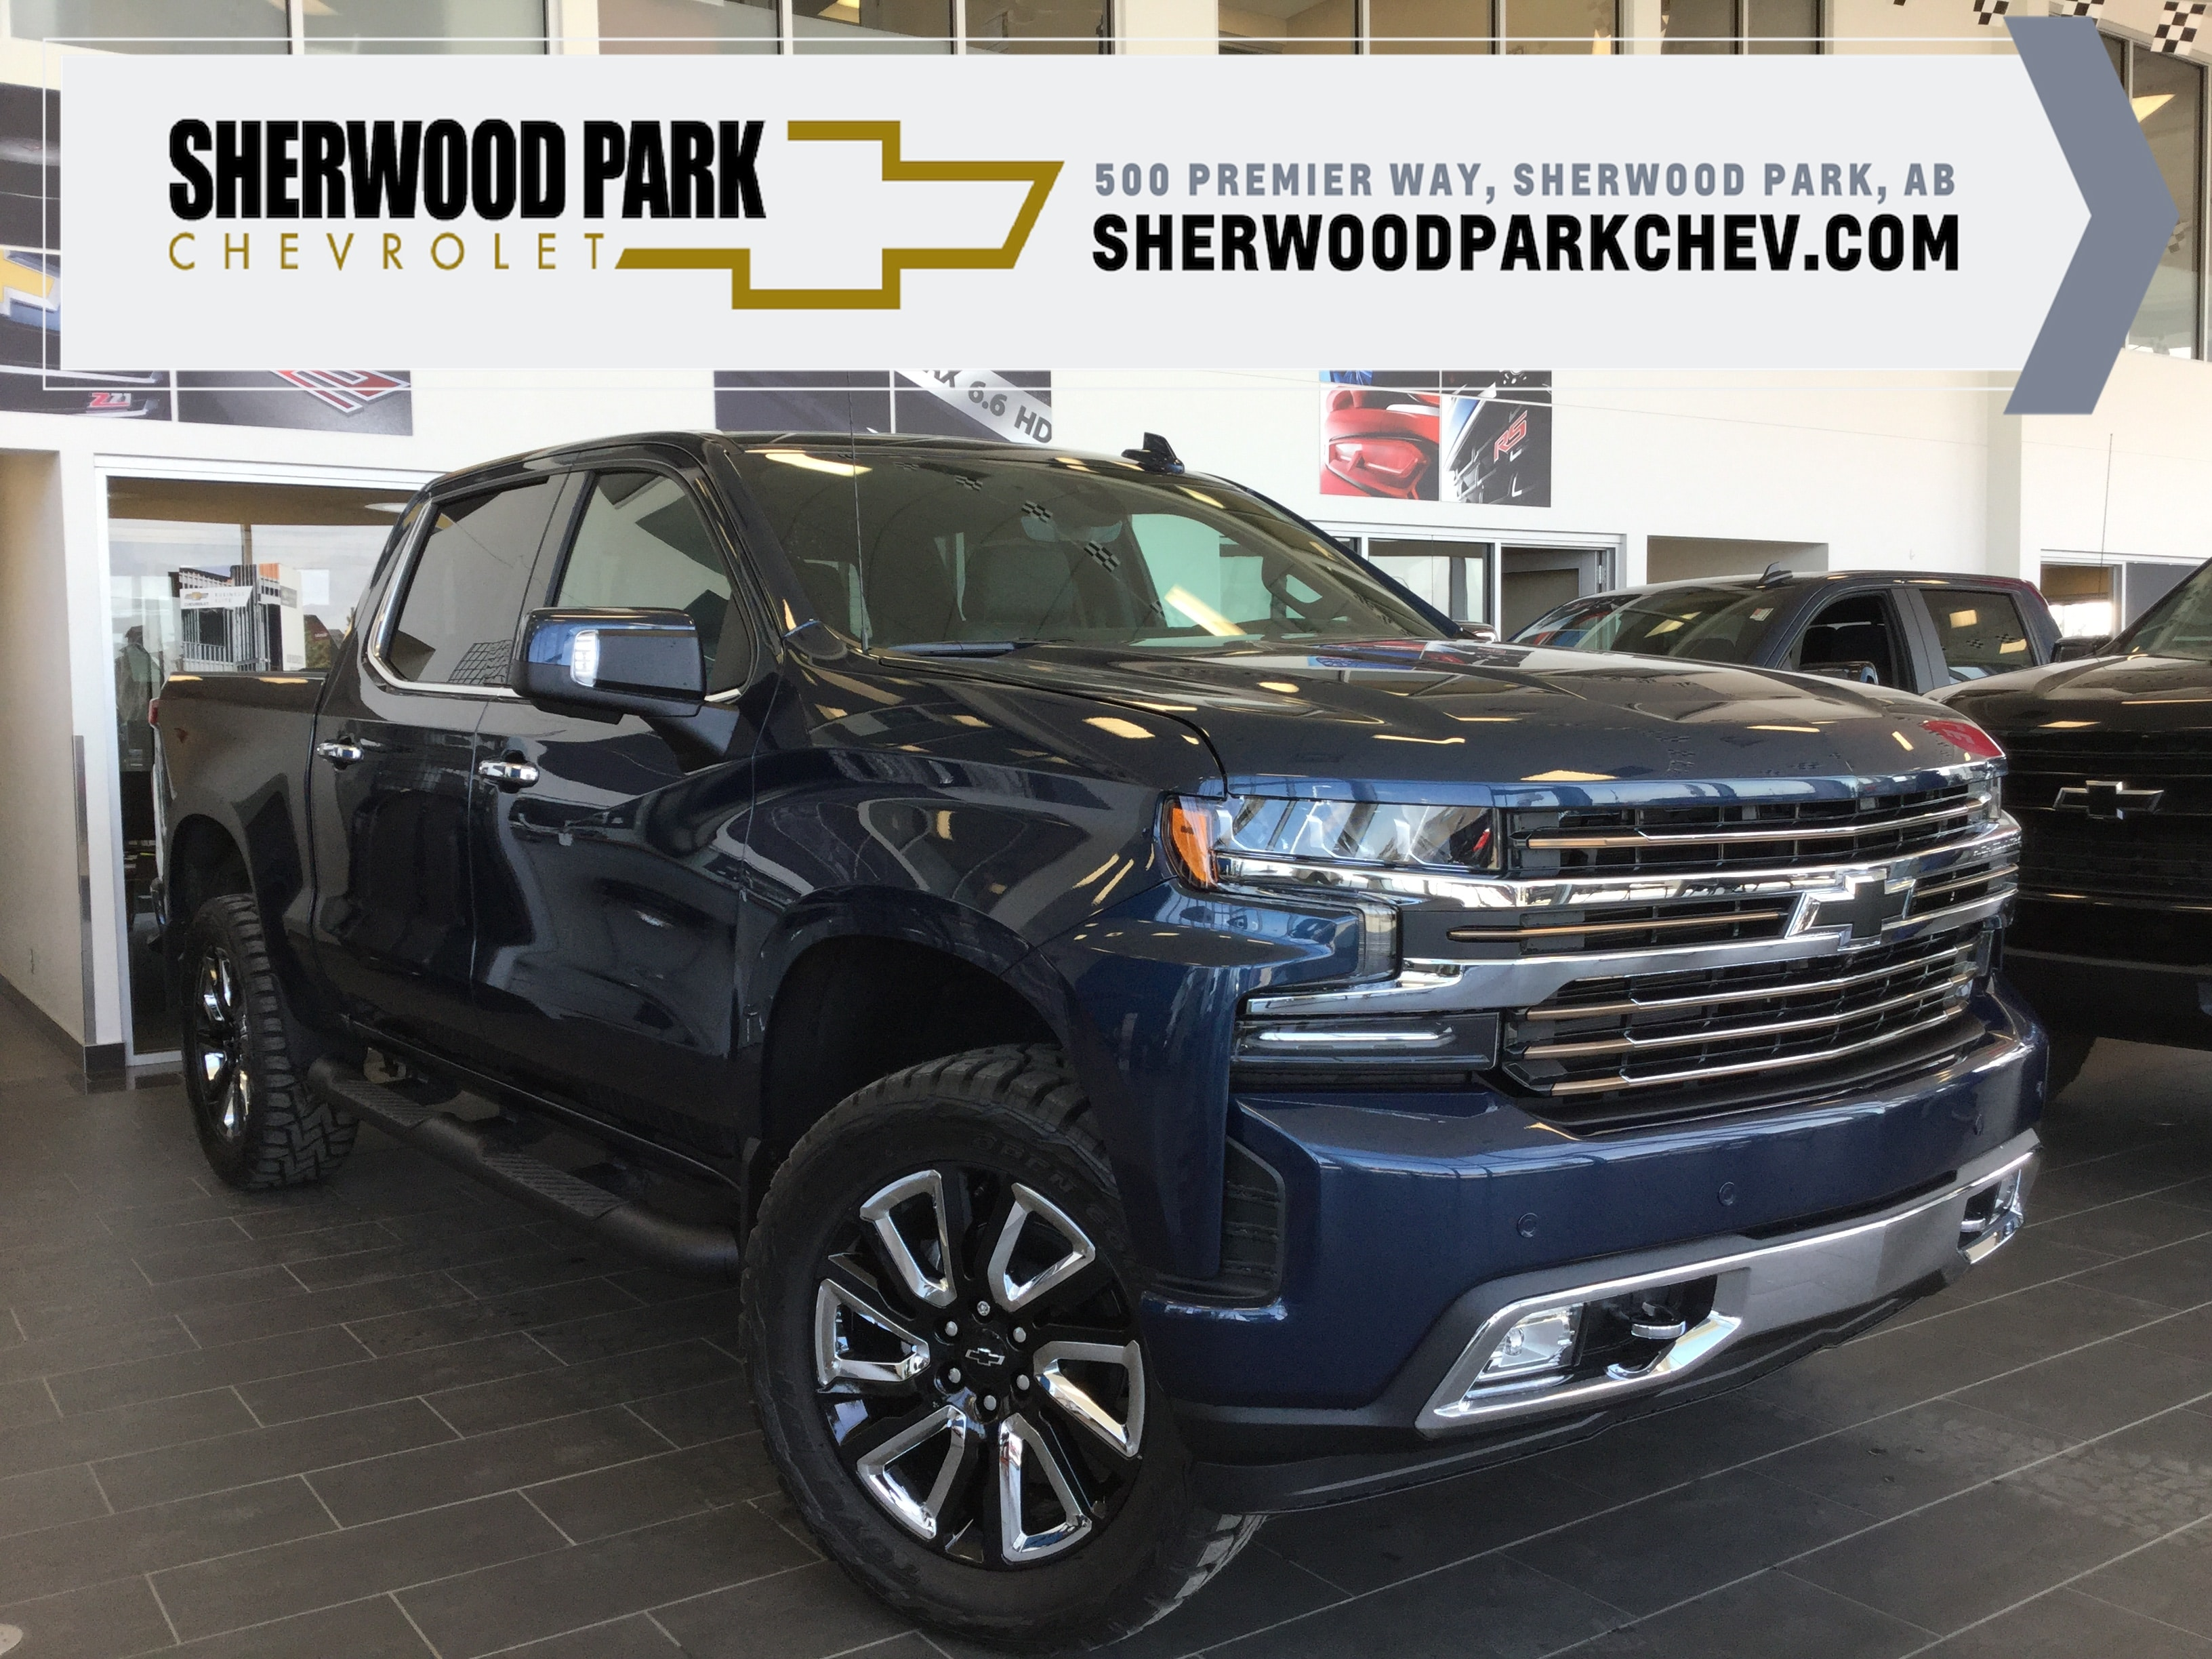 2019 Chevrolet Silverado 1500 High Country | 22